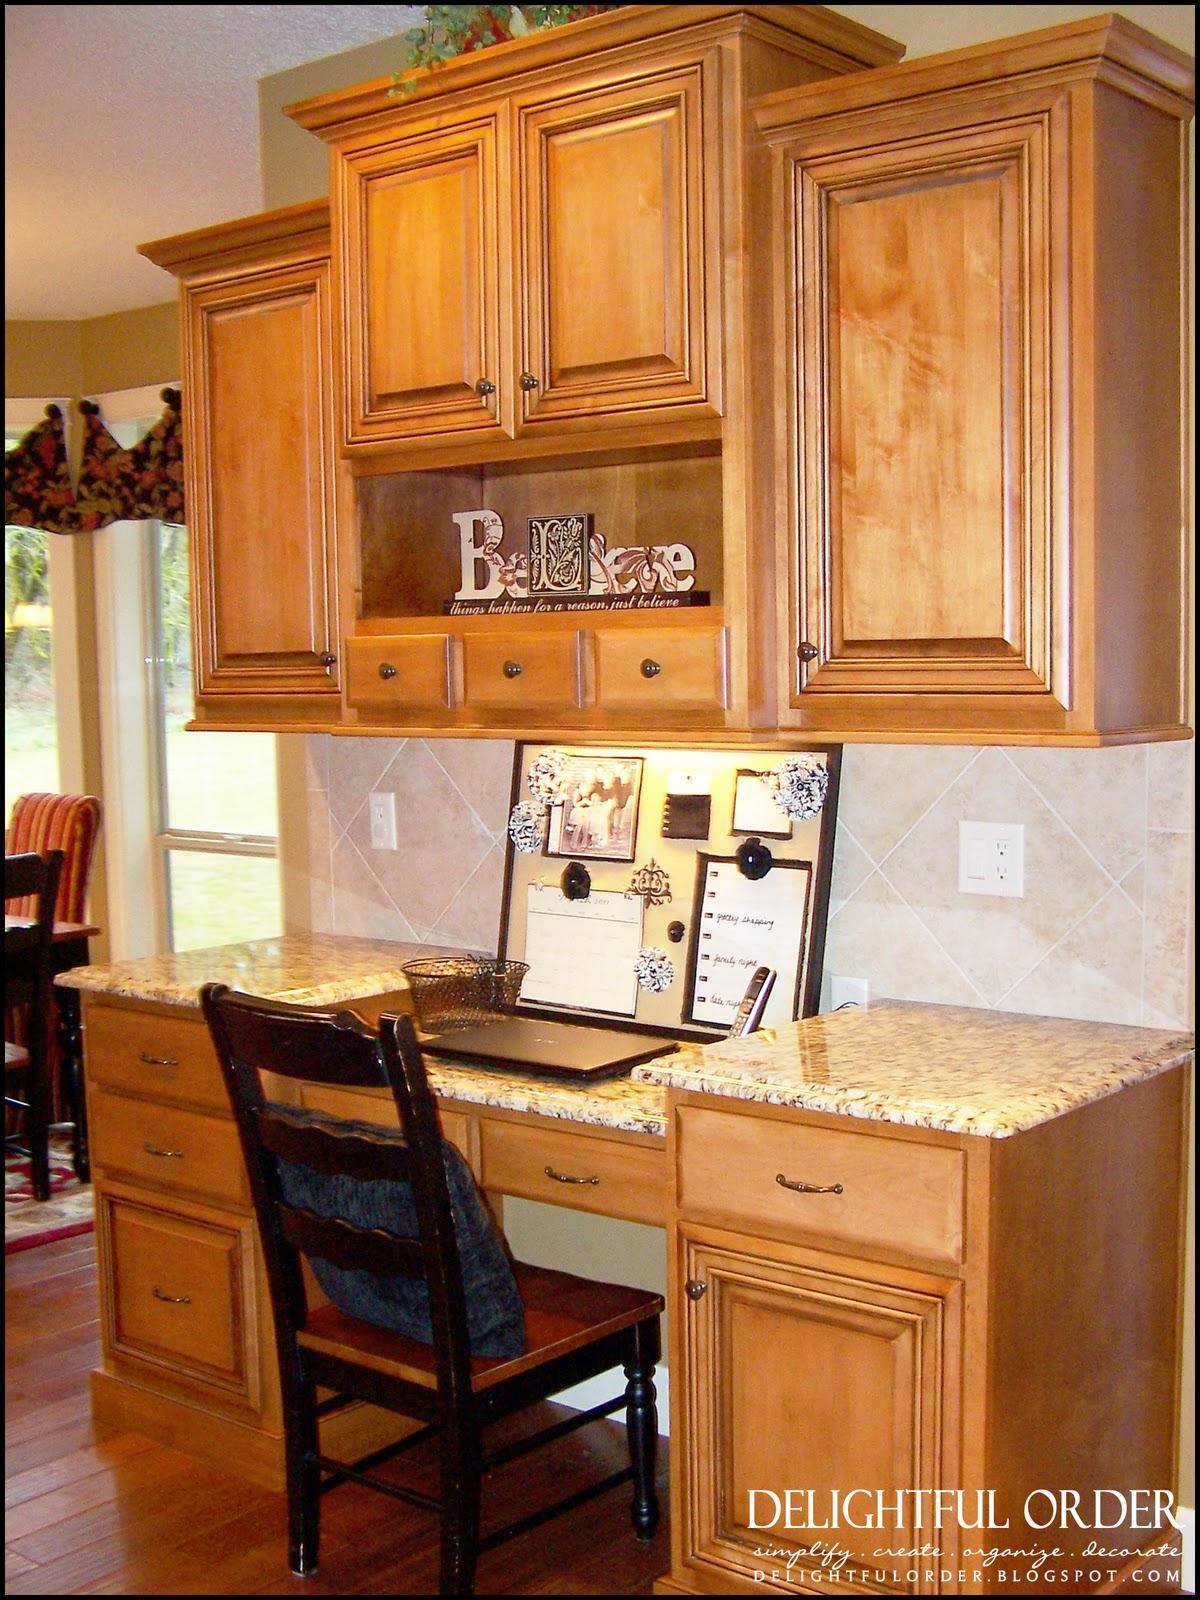 Kitchen Desk Cabinets Delightful Order Kitchen Command Center